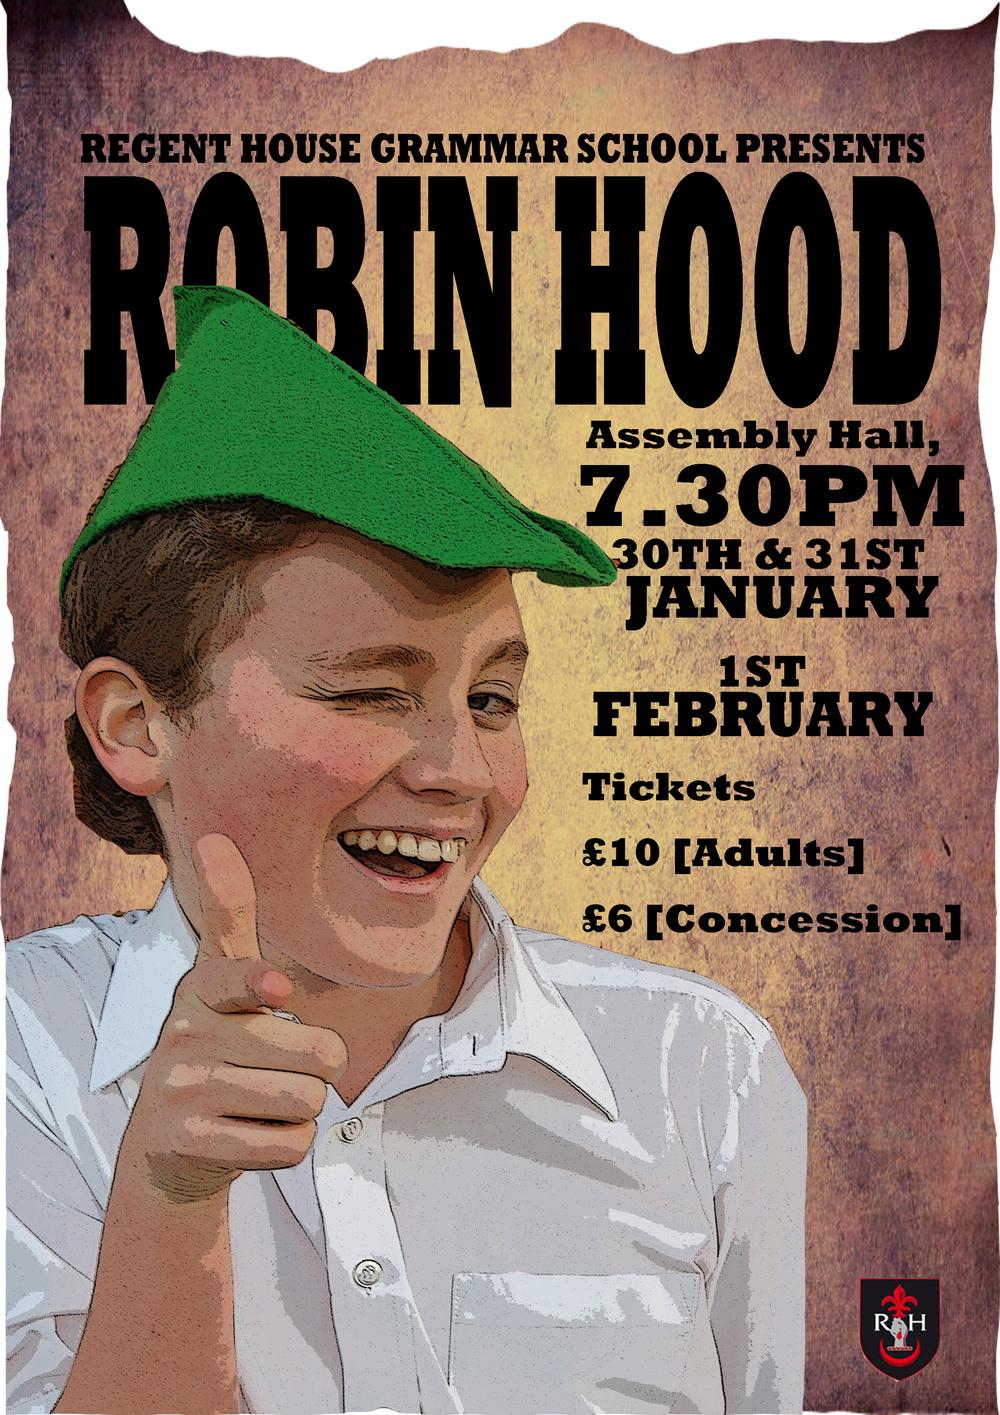 ROBIN HOOD 2+1ffinal.jpg